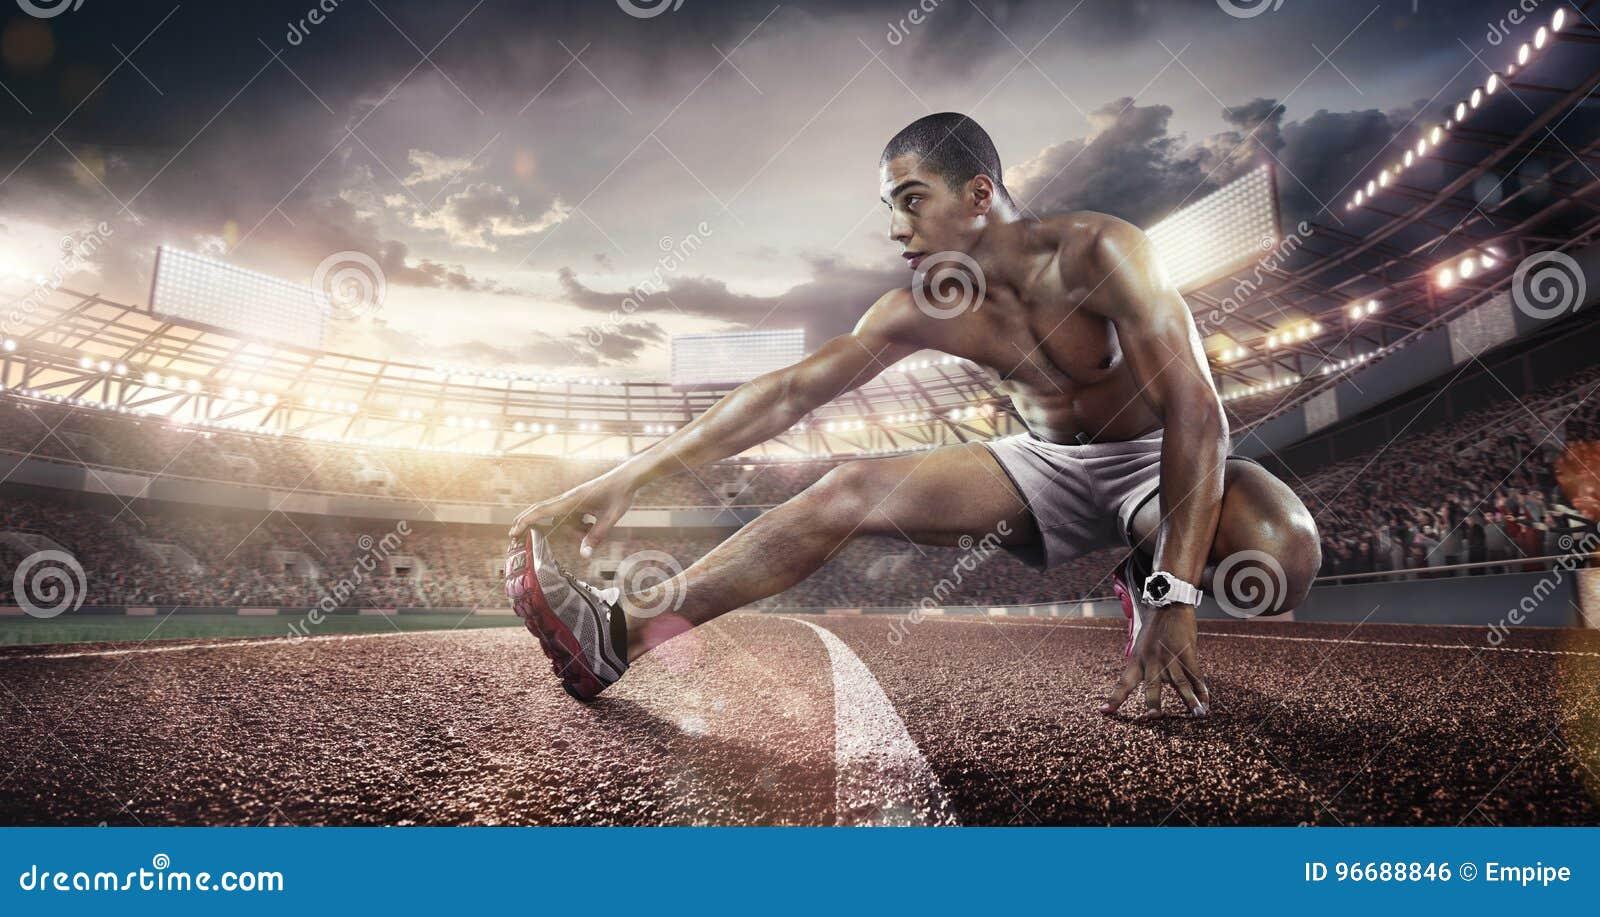 Sport Backgrounds. Soccer stadium and running track. 3d render